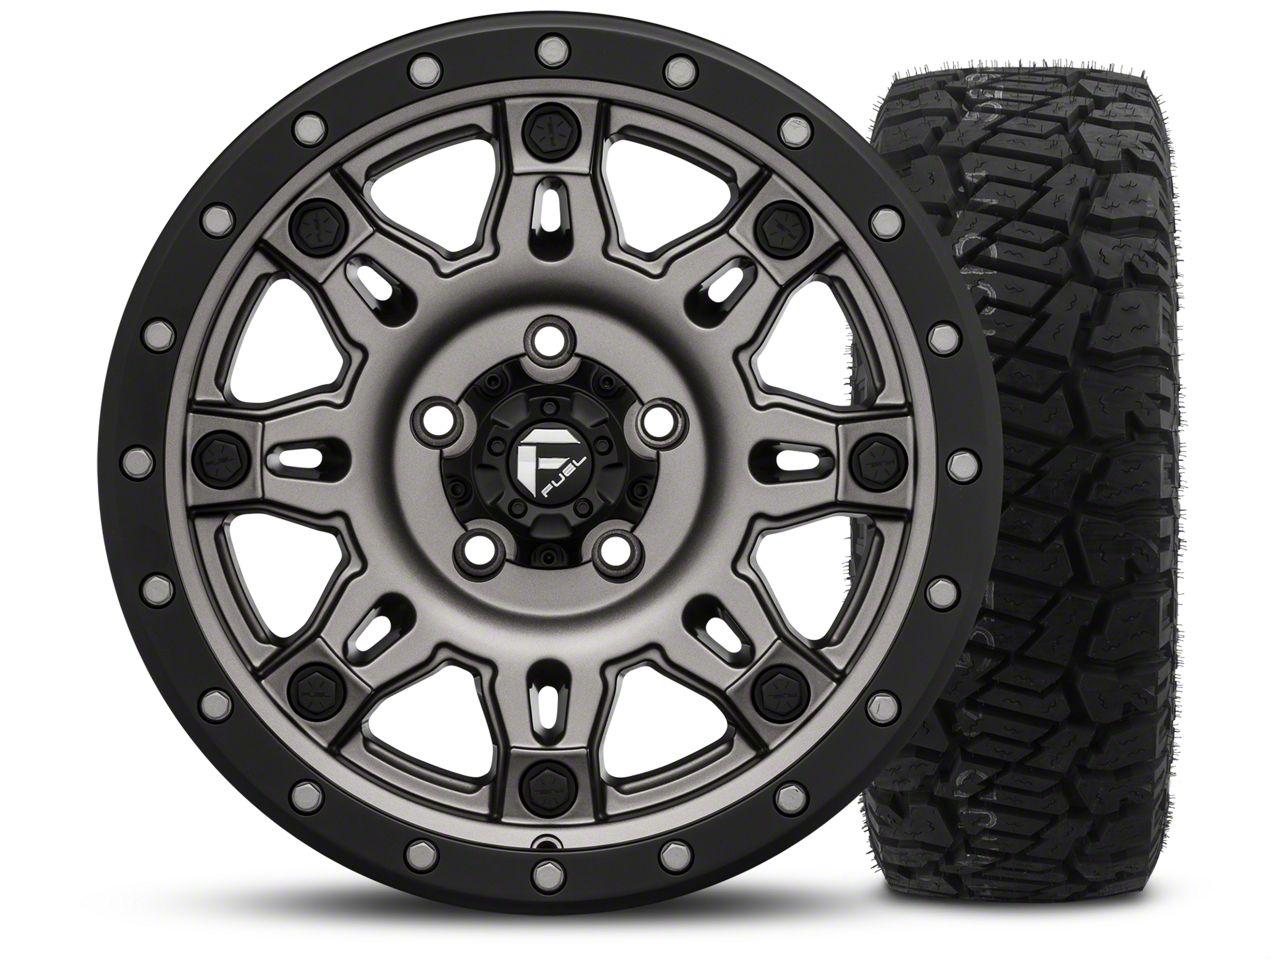 Fuel Wheels Hostage III Gunmetal and Black - 17x9 Wheel - and Dick Cepek Fun Country Tire - 315/70R17 (07-18 Jeep Wrangler JK)